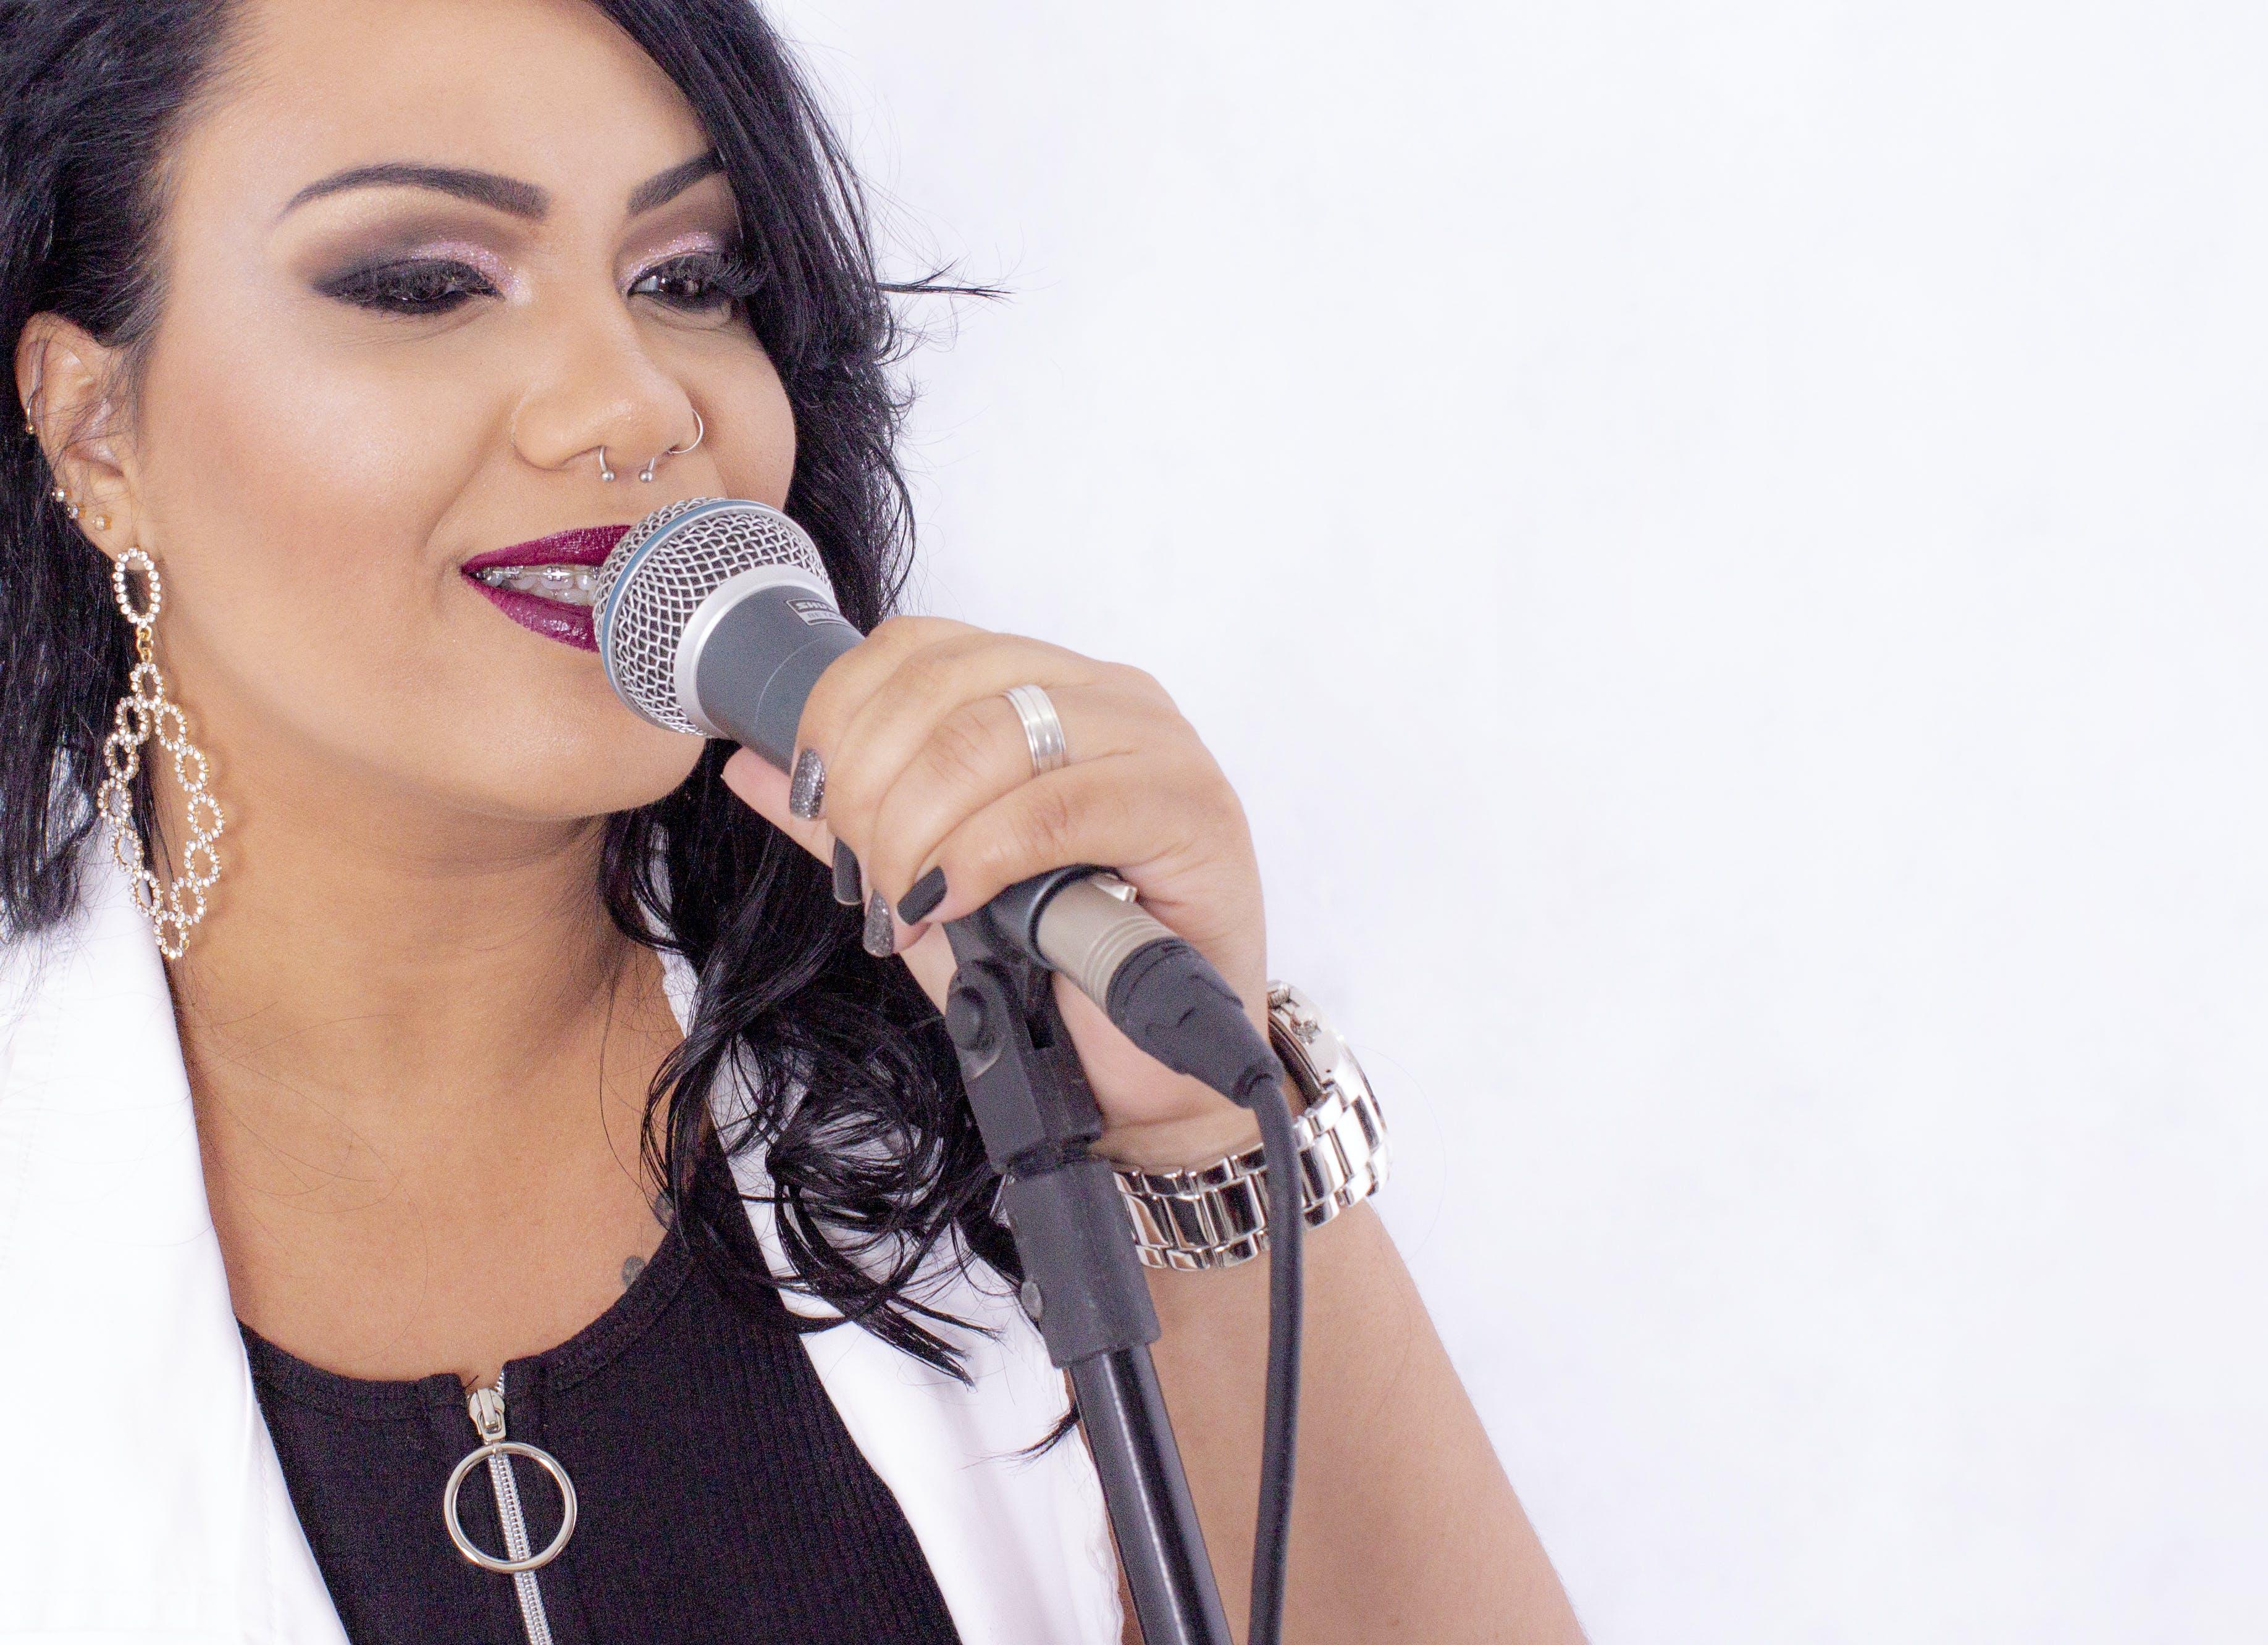 microphone, singer, woman singer